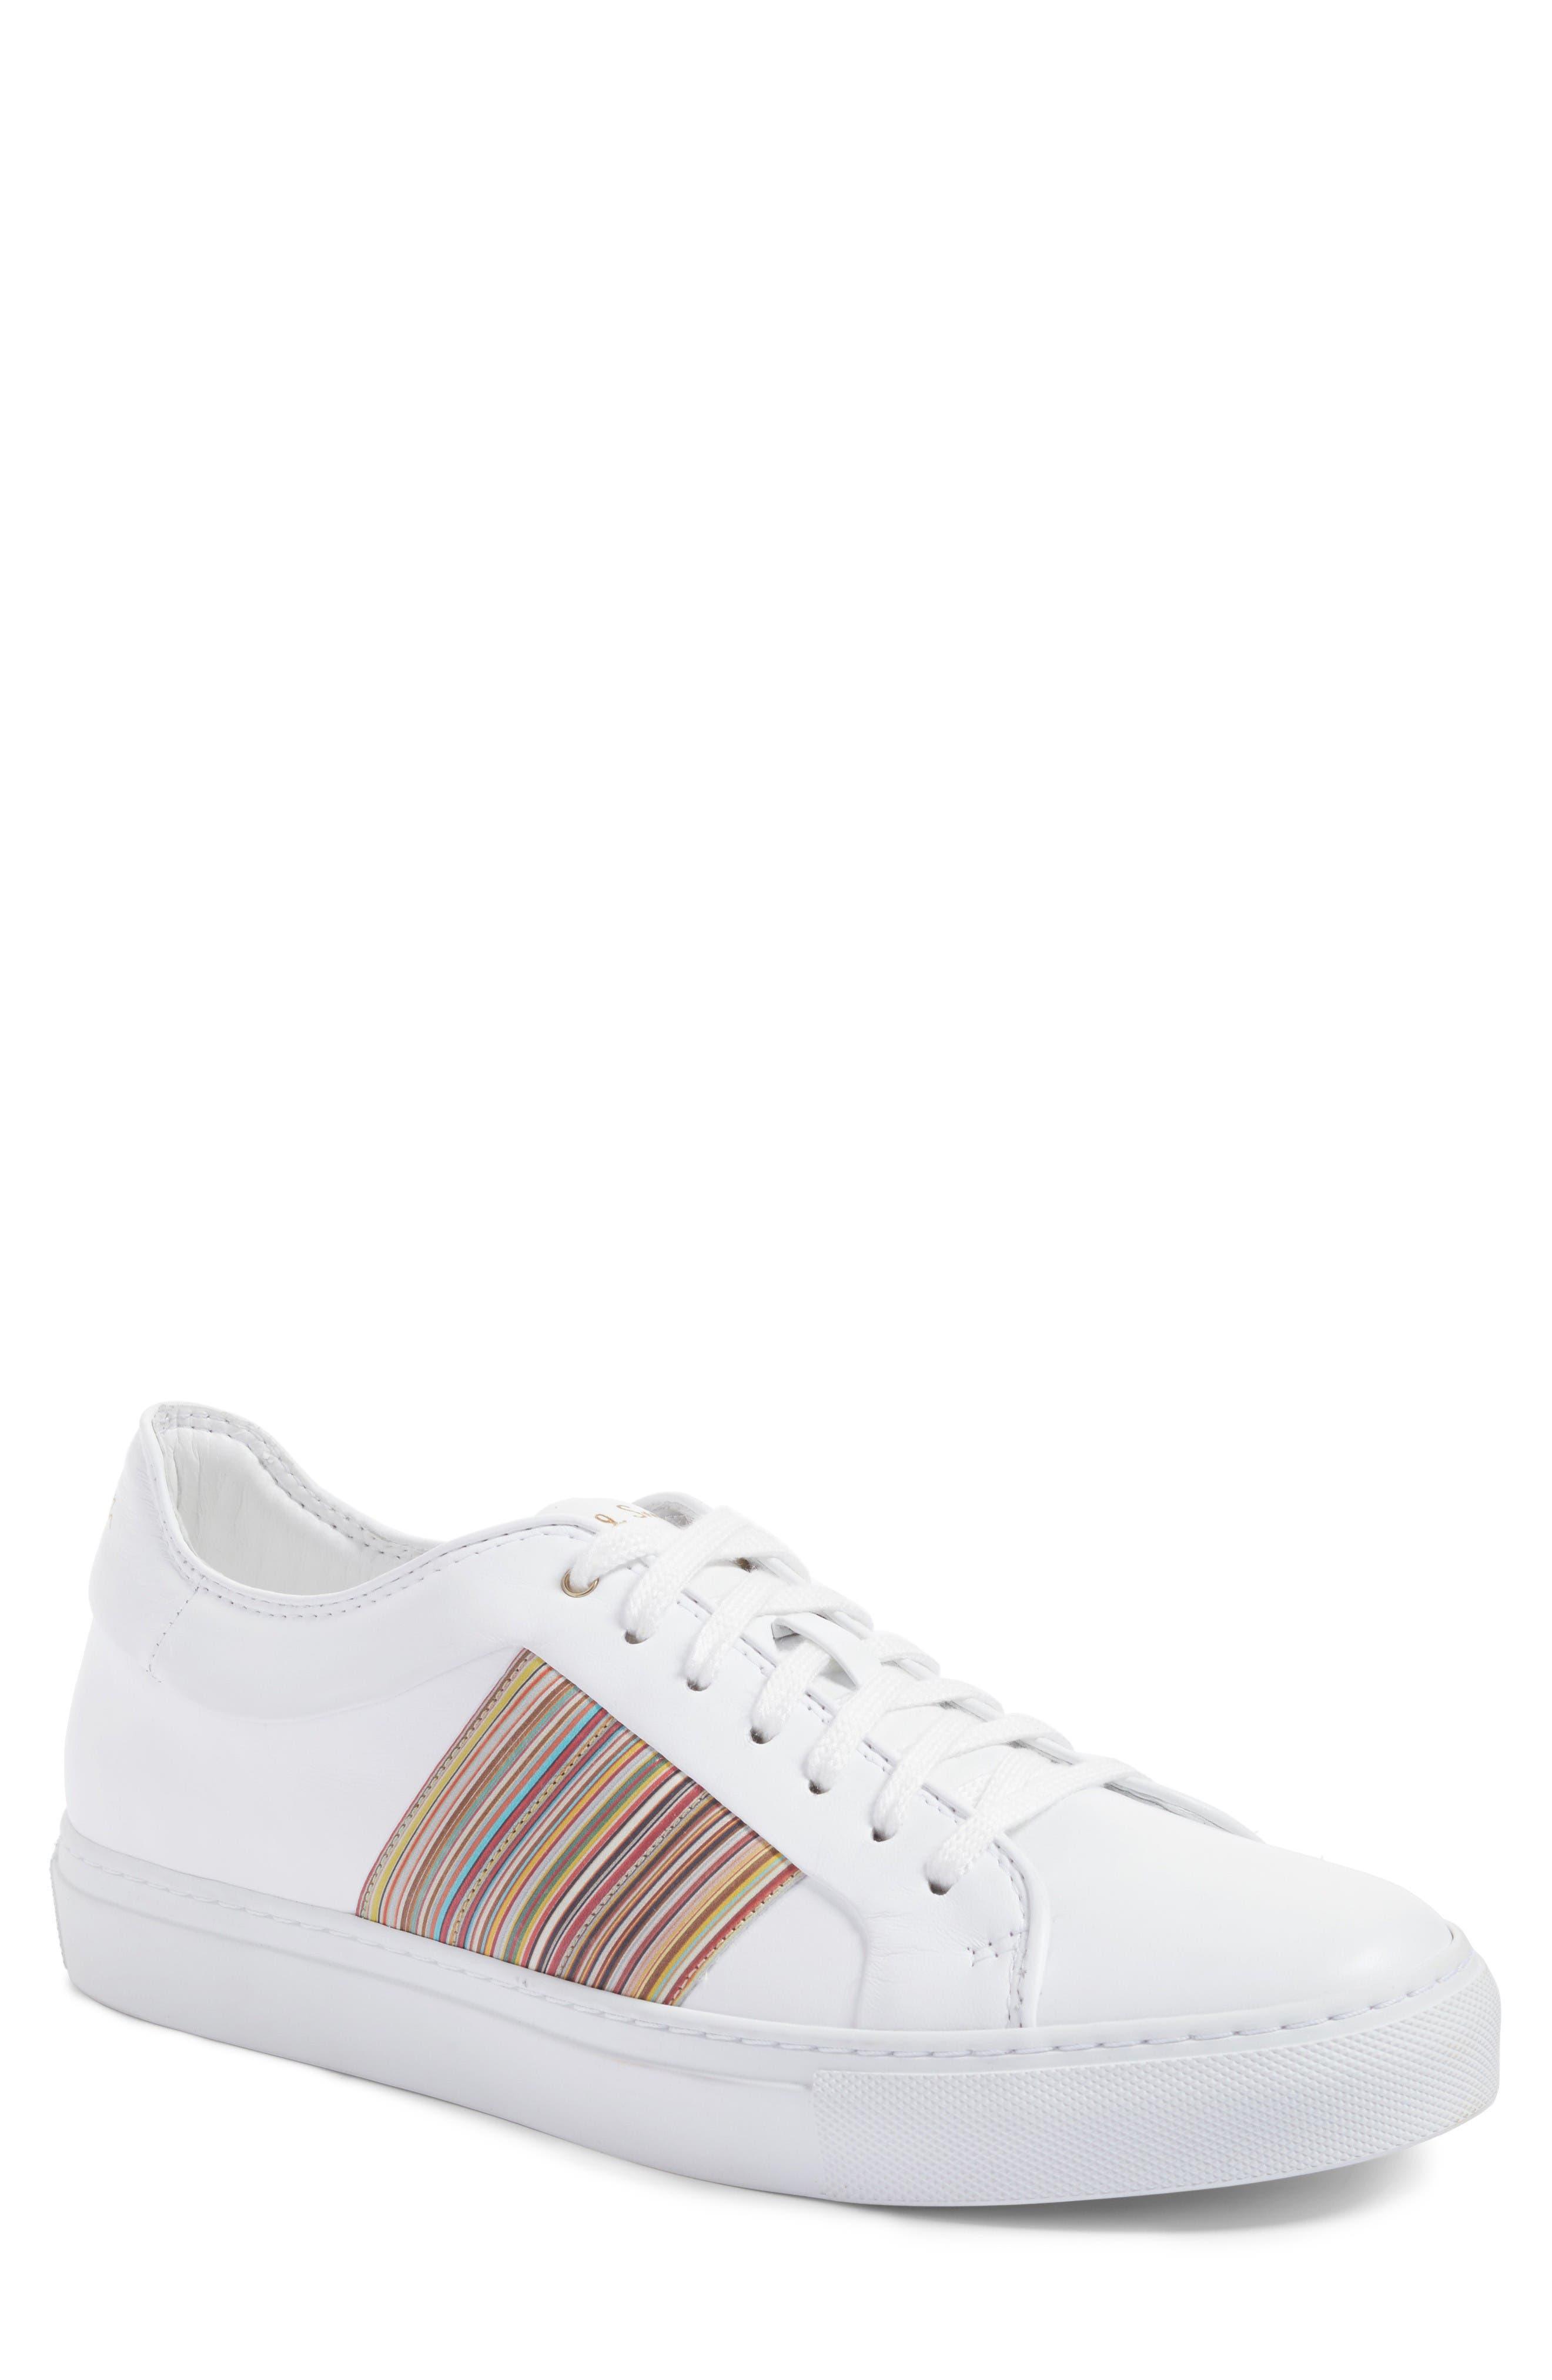 Ivo Sneaker,                             Main thumbnail 1, color,                             White